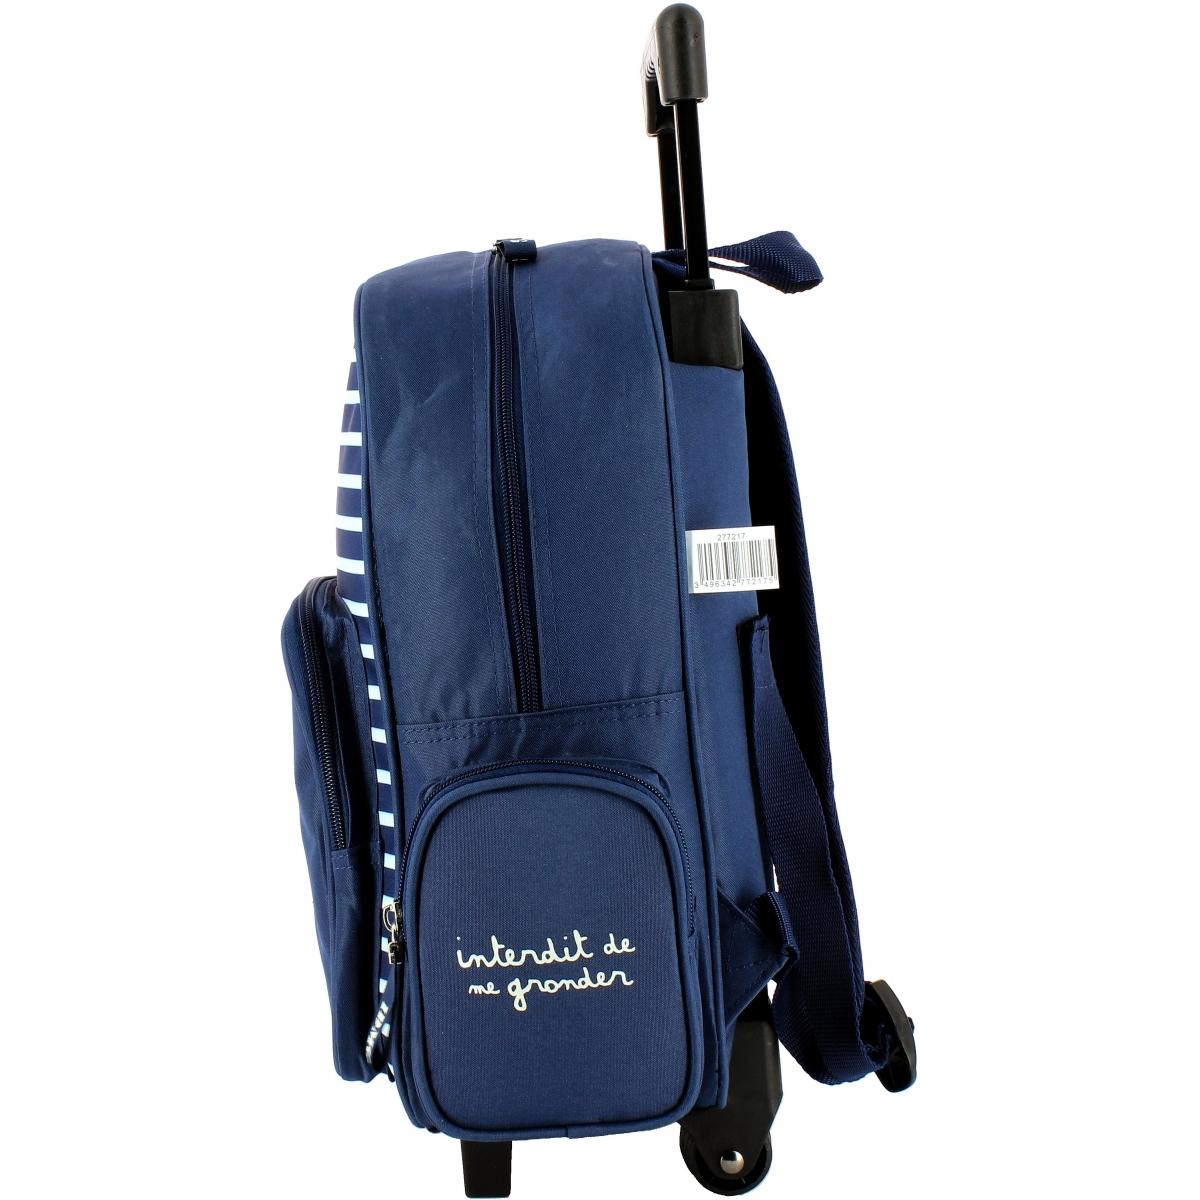 mini sac dos roulettes school pack 27721 couleur principale assortis promotion. Black Bedroom Furniture Sets. Home Design Ideas